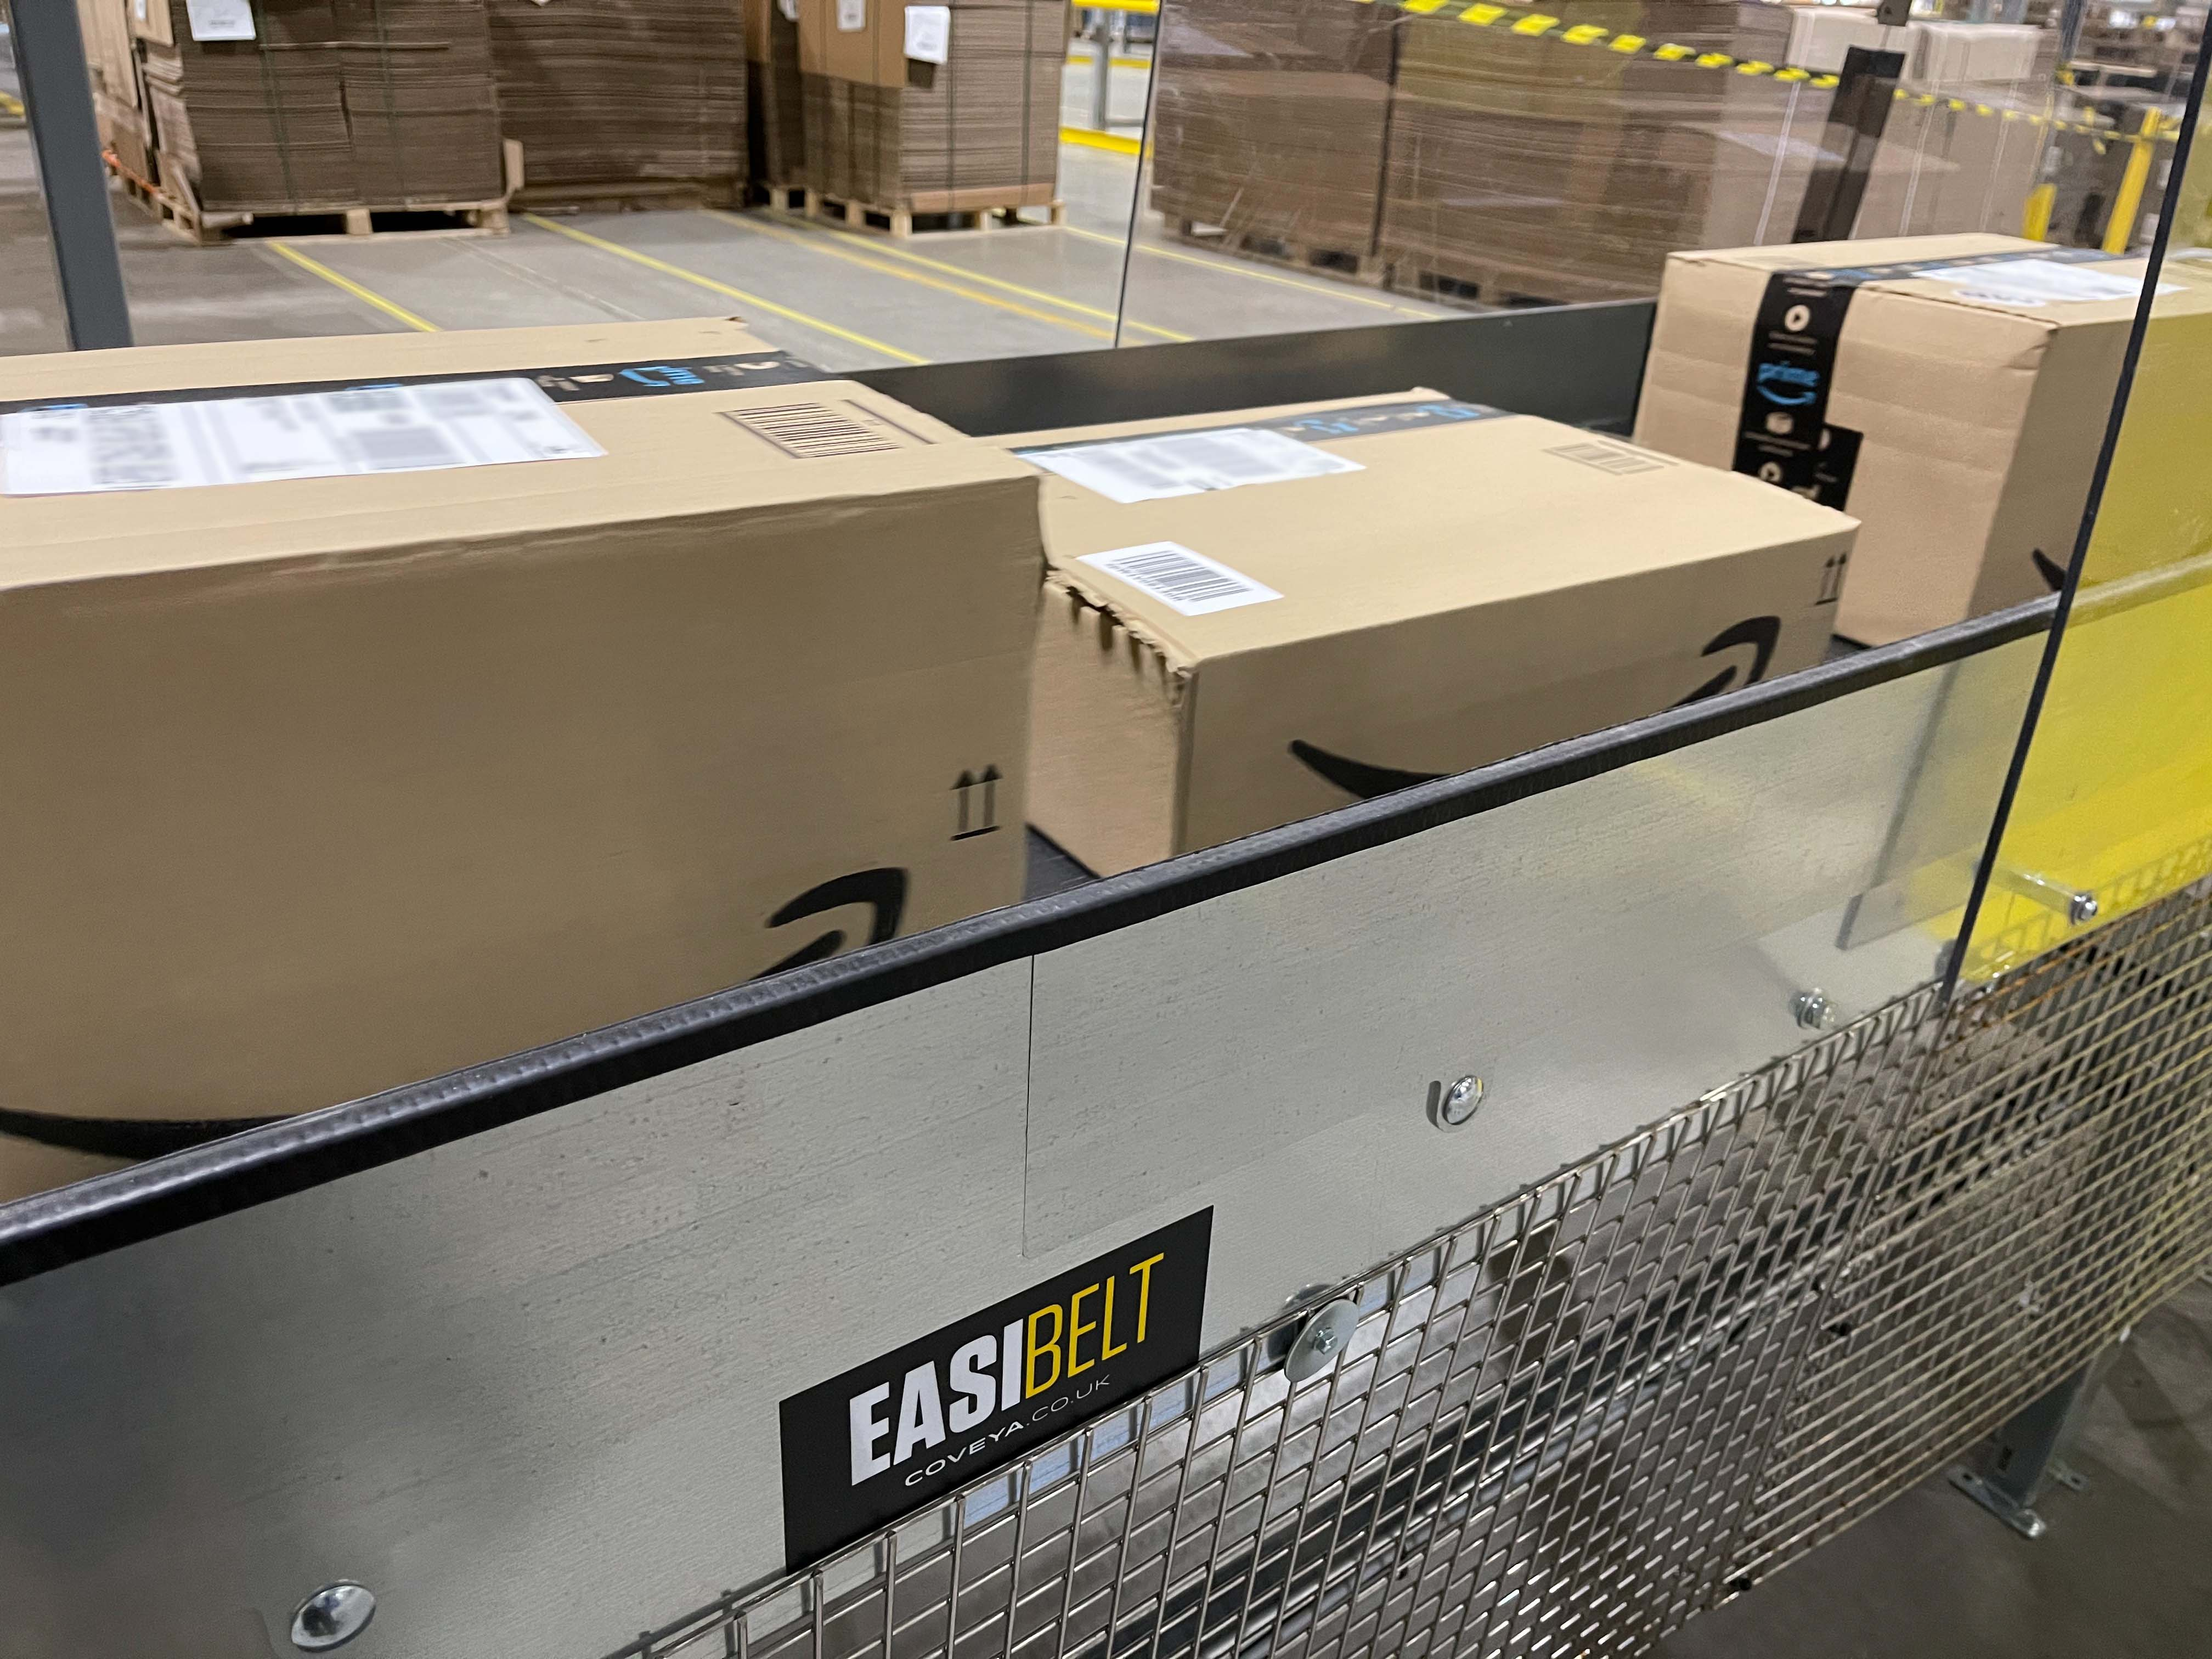 Amazon Milton Keynes Distribution center: A&S Engineering [Easibelt Conveyors & 600mm Powered Lineshaft 90-Degree Bend Conveyor]